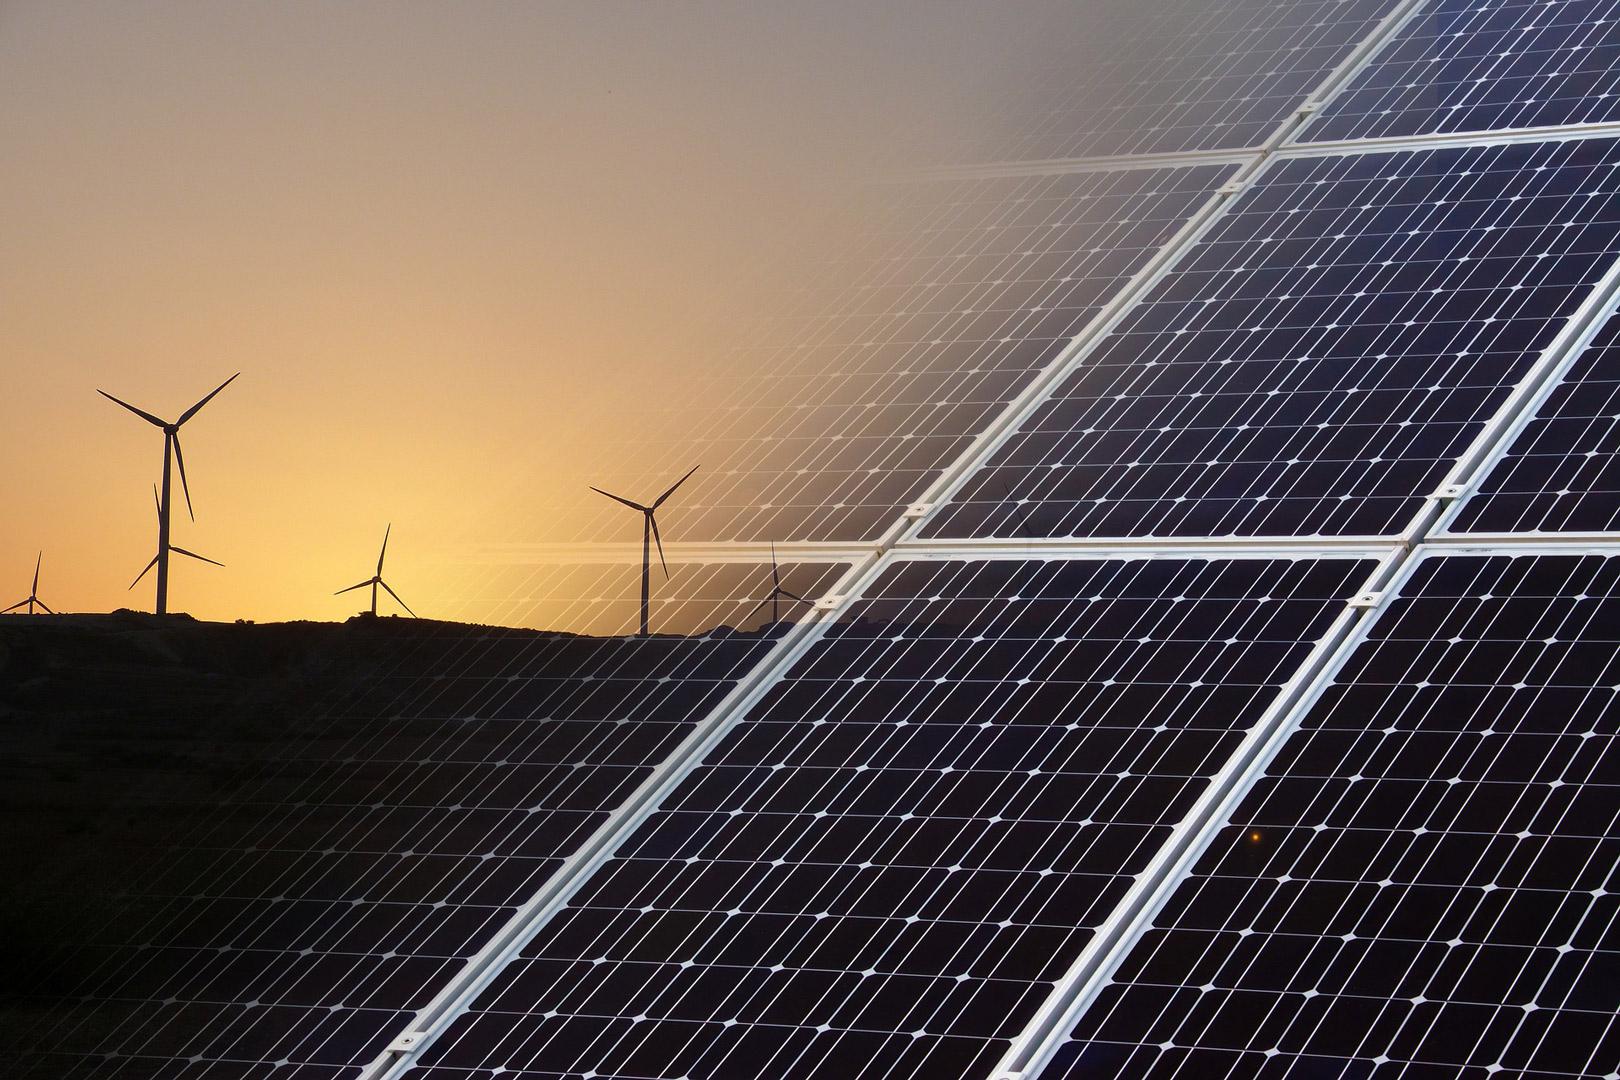 renewable solar wind - Accueil enair france - Accueil enair france